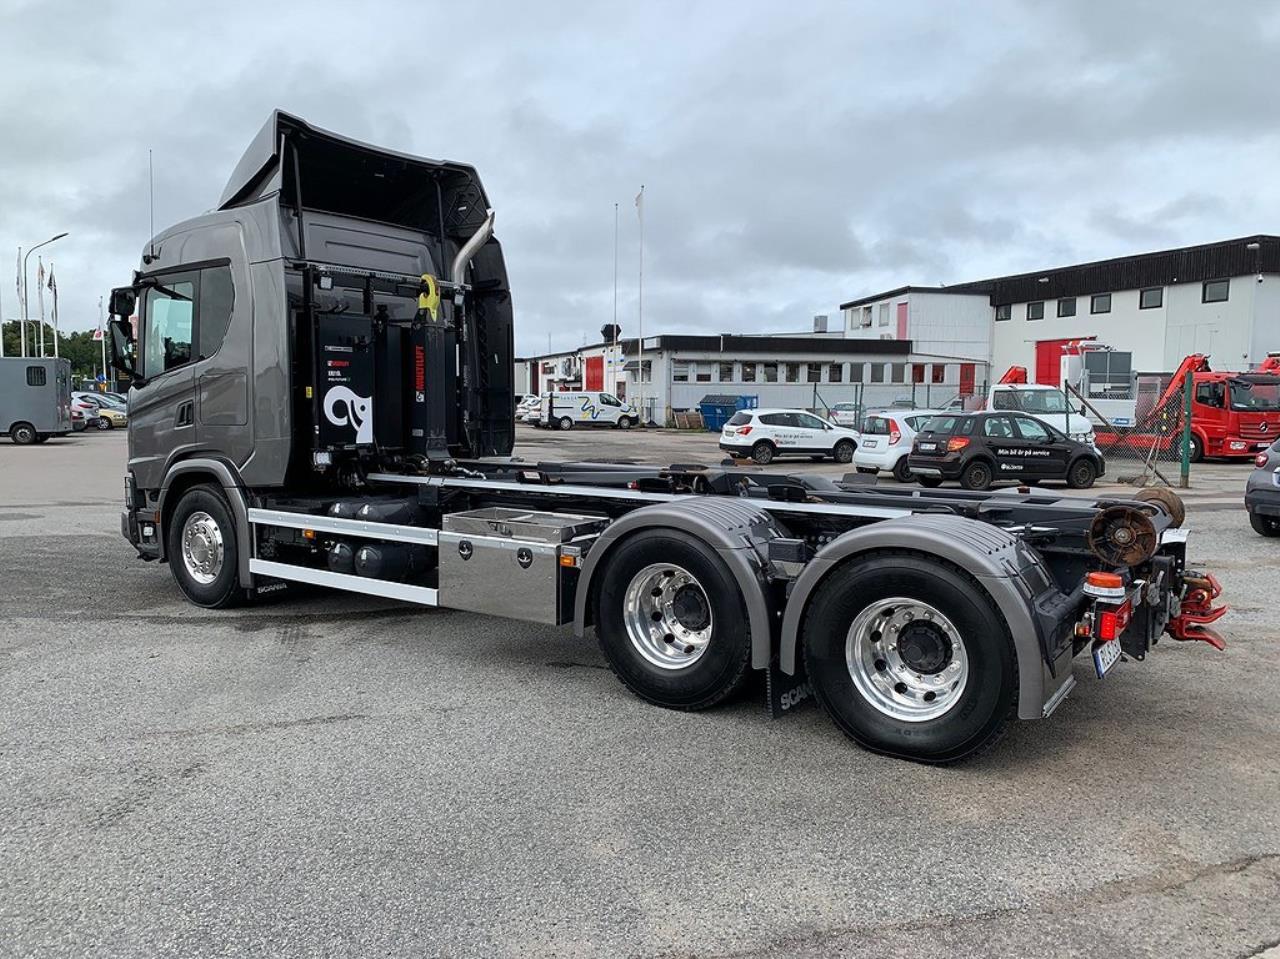 Scania G500 XT 6x4 Lastväxlare Euro 6 2017 - Krok/Lastväxlare